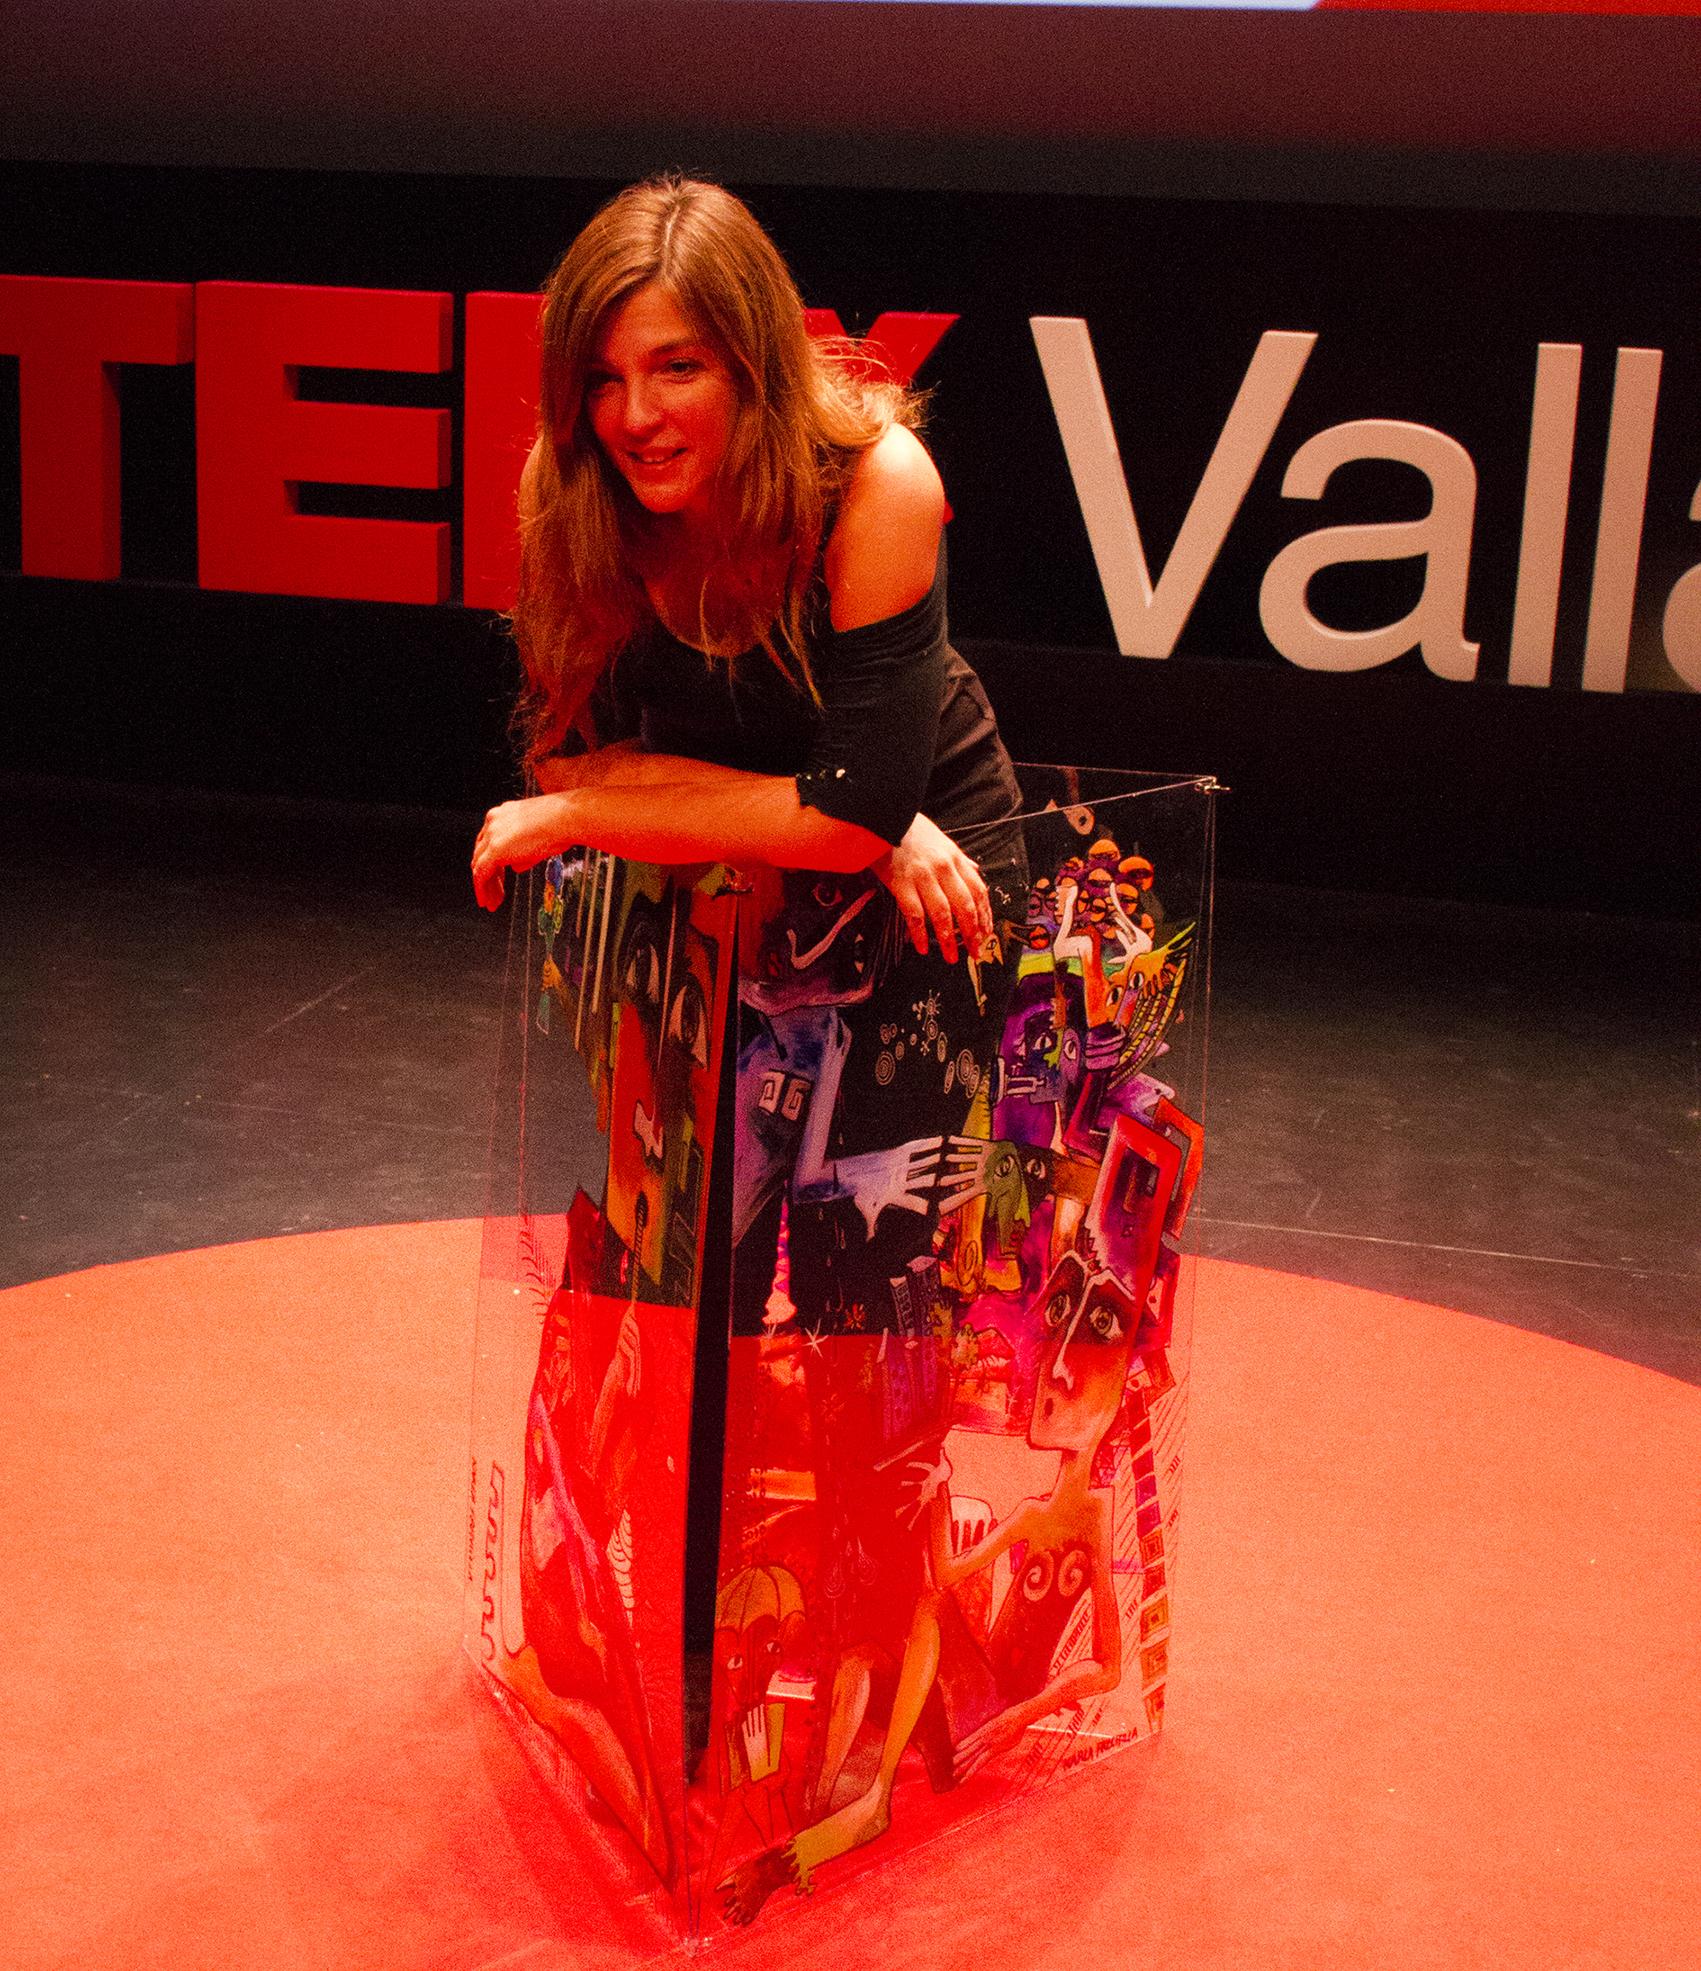 TEDX Valladolid. Karla Frechilla